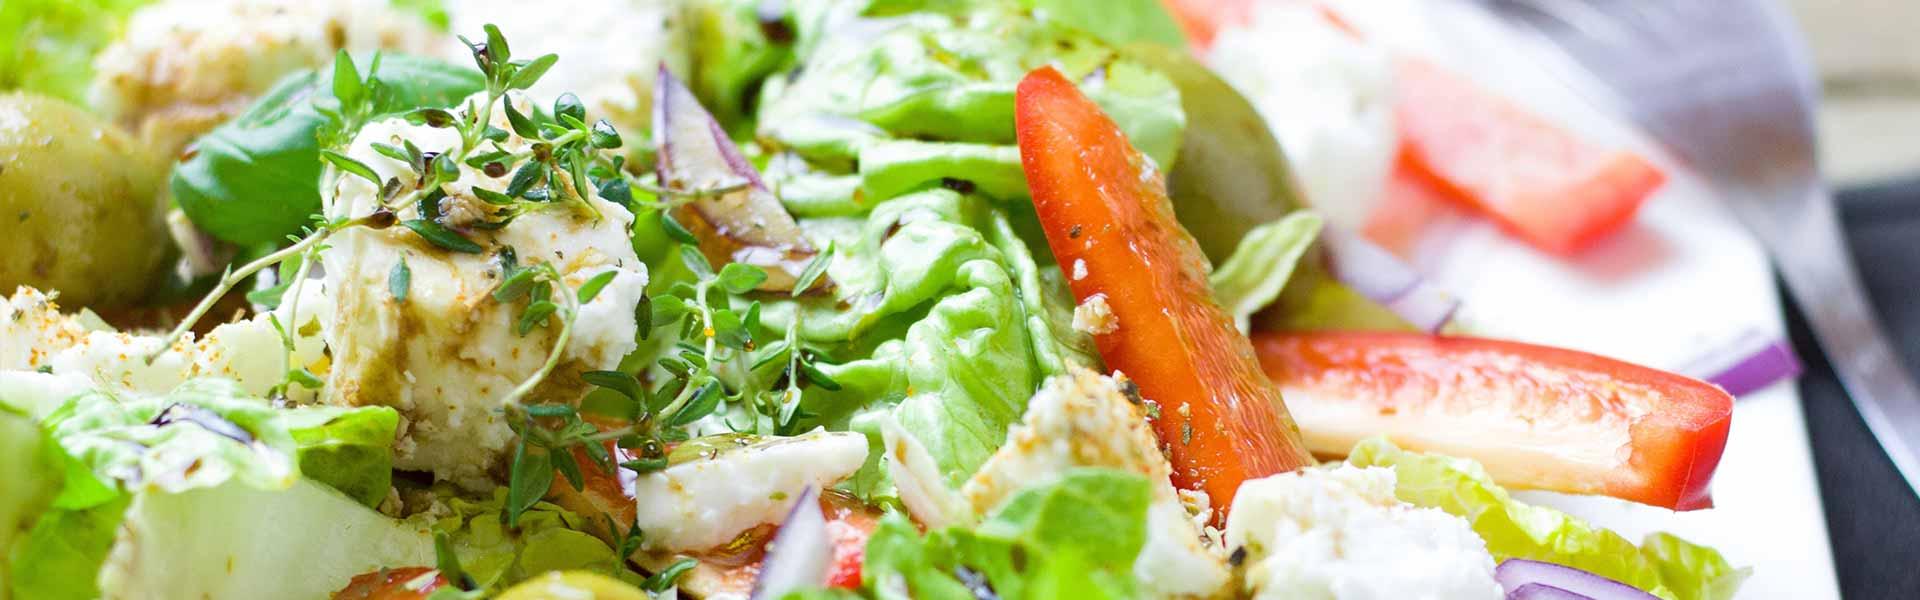 salad-large